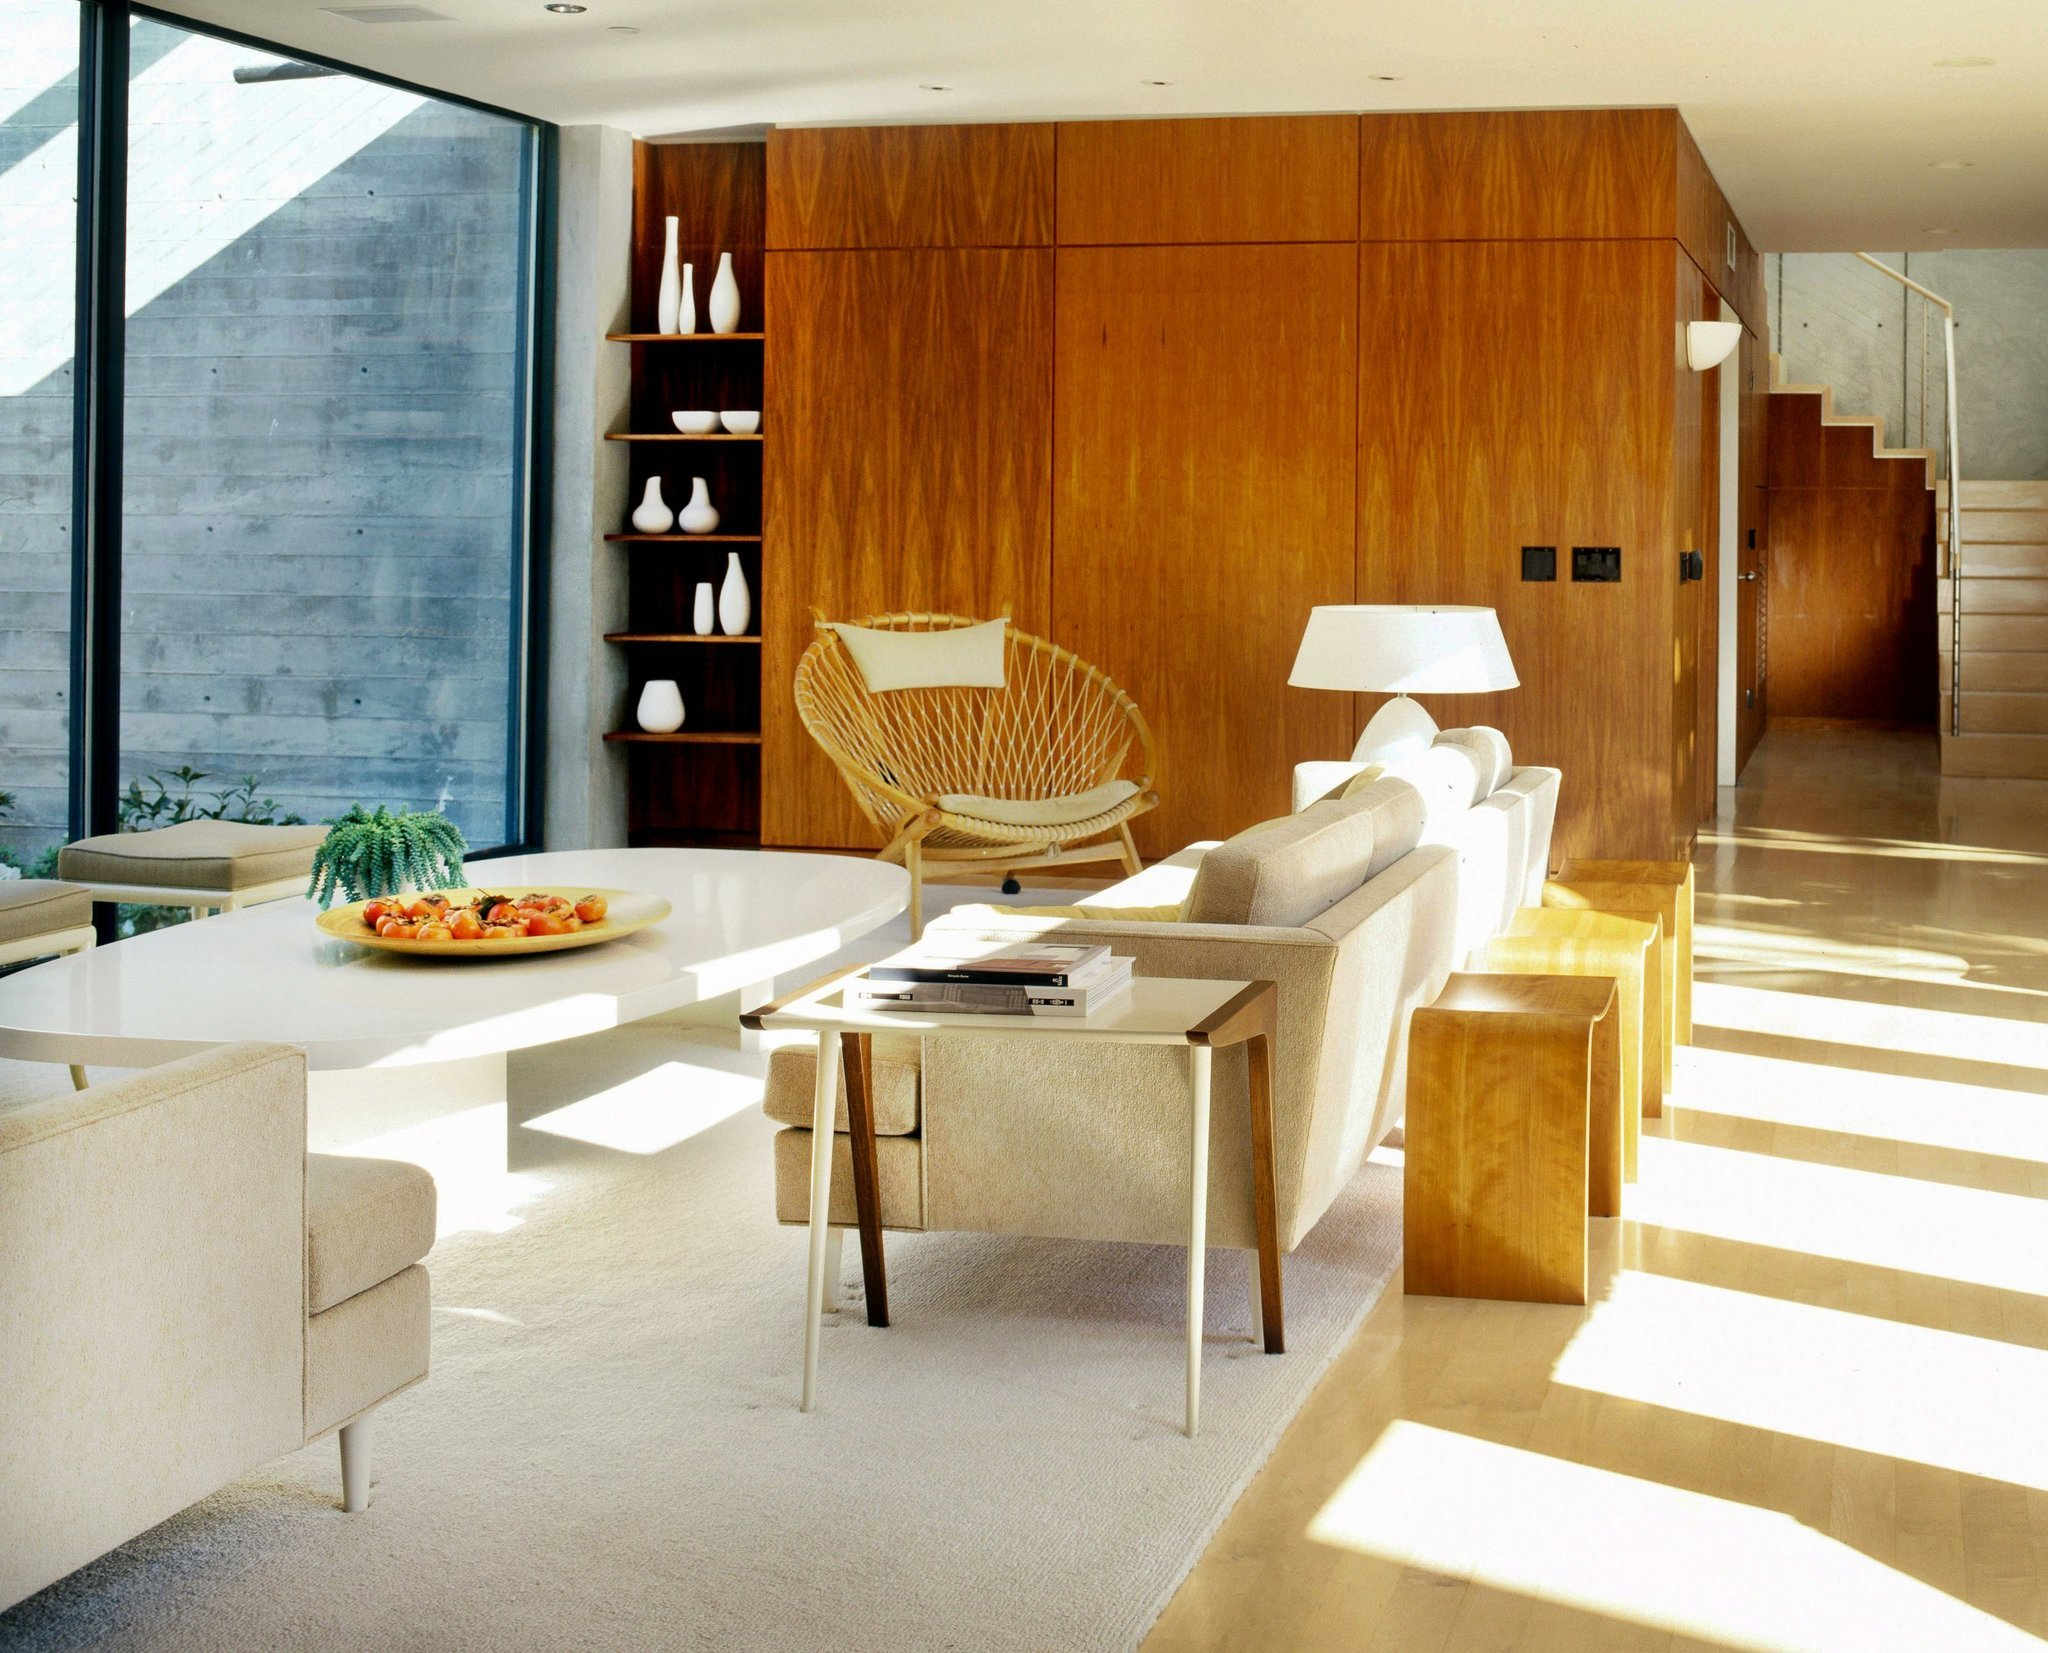 Five lasting home design trends